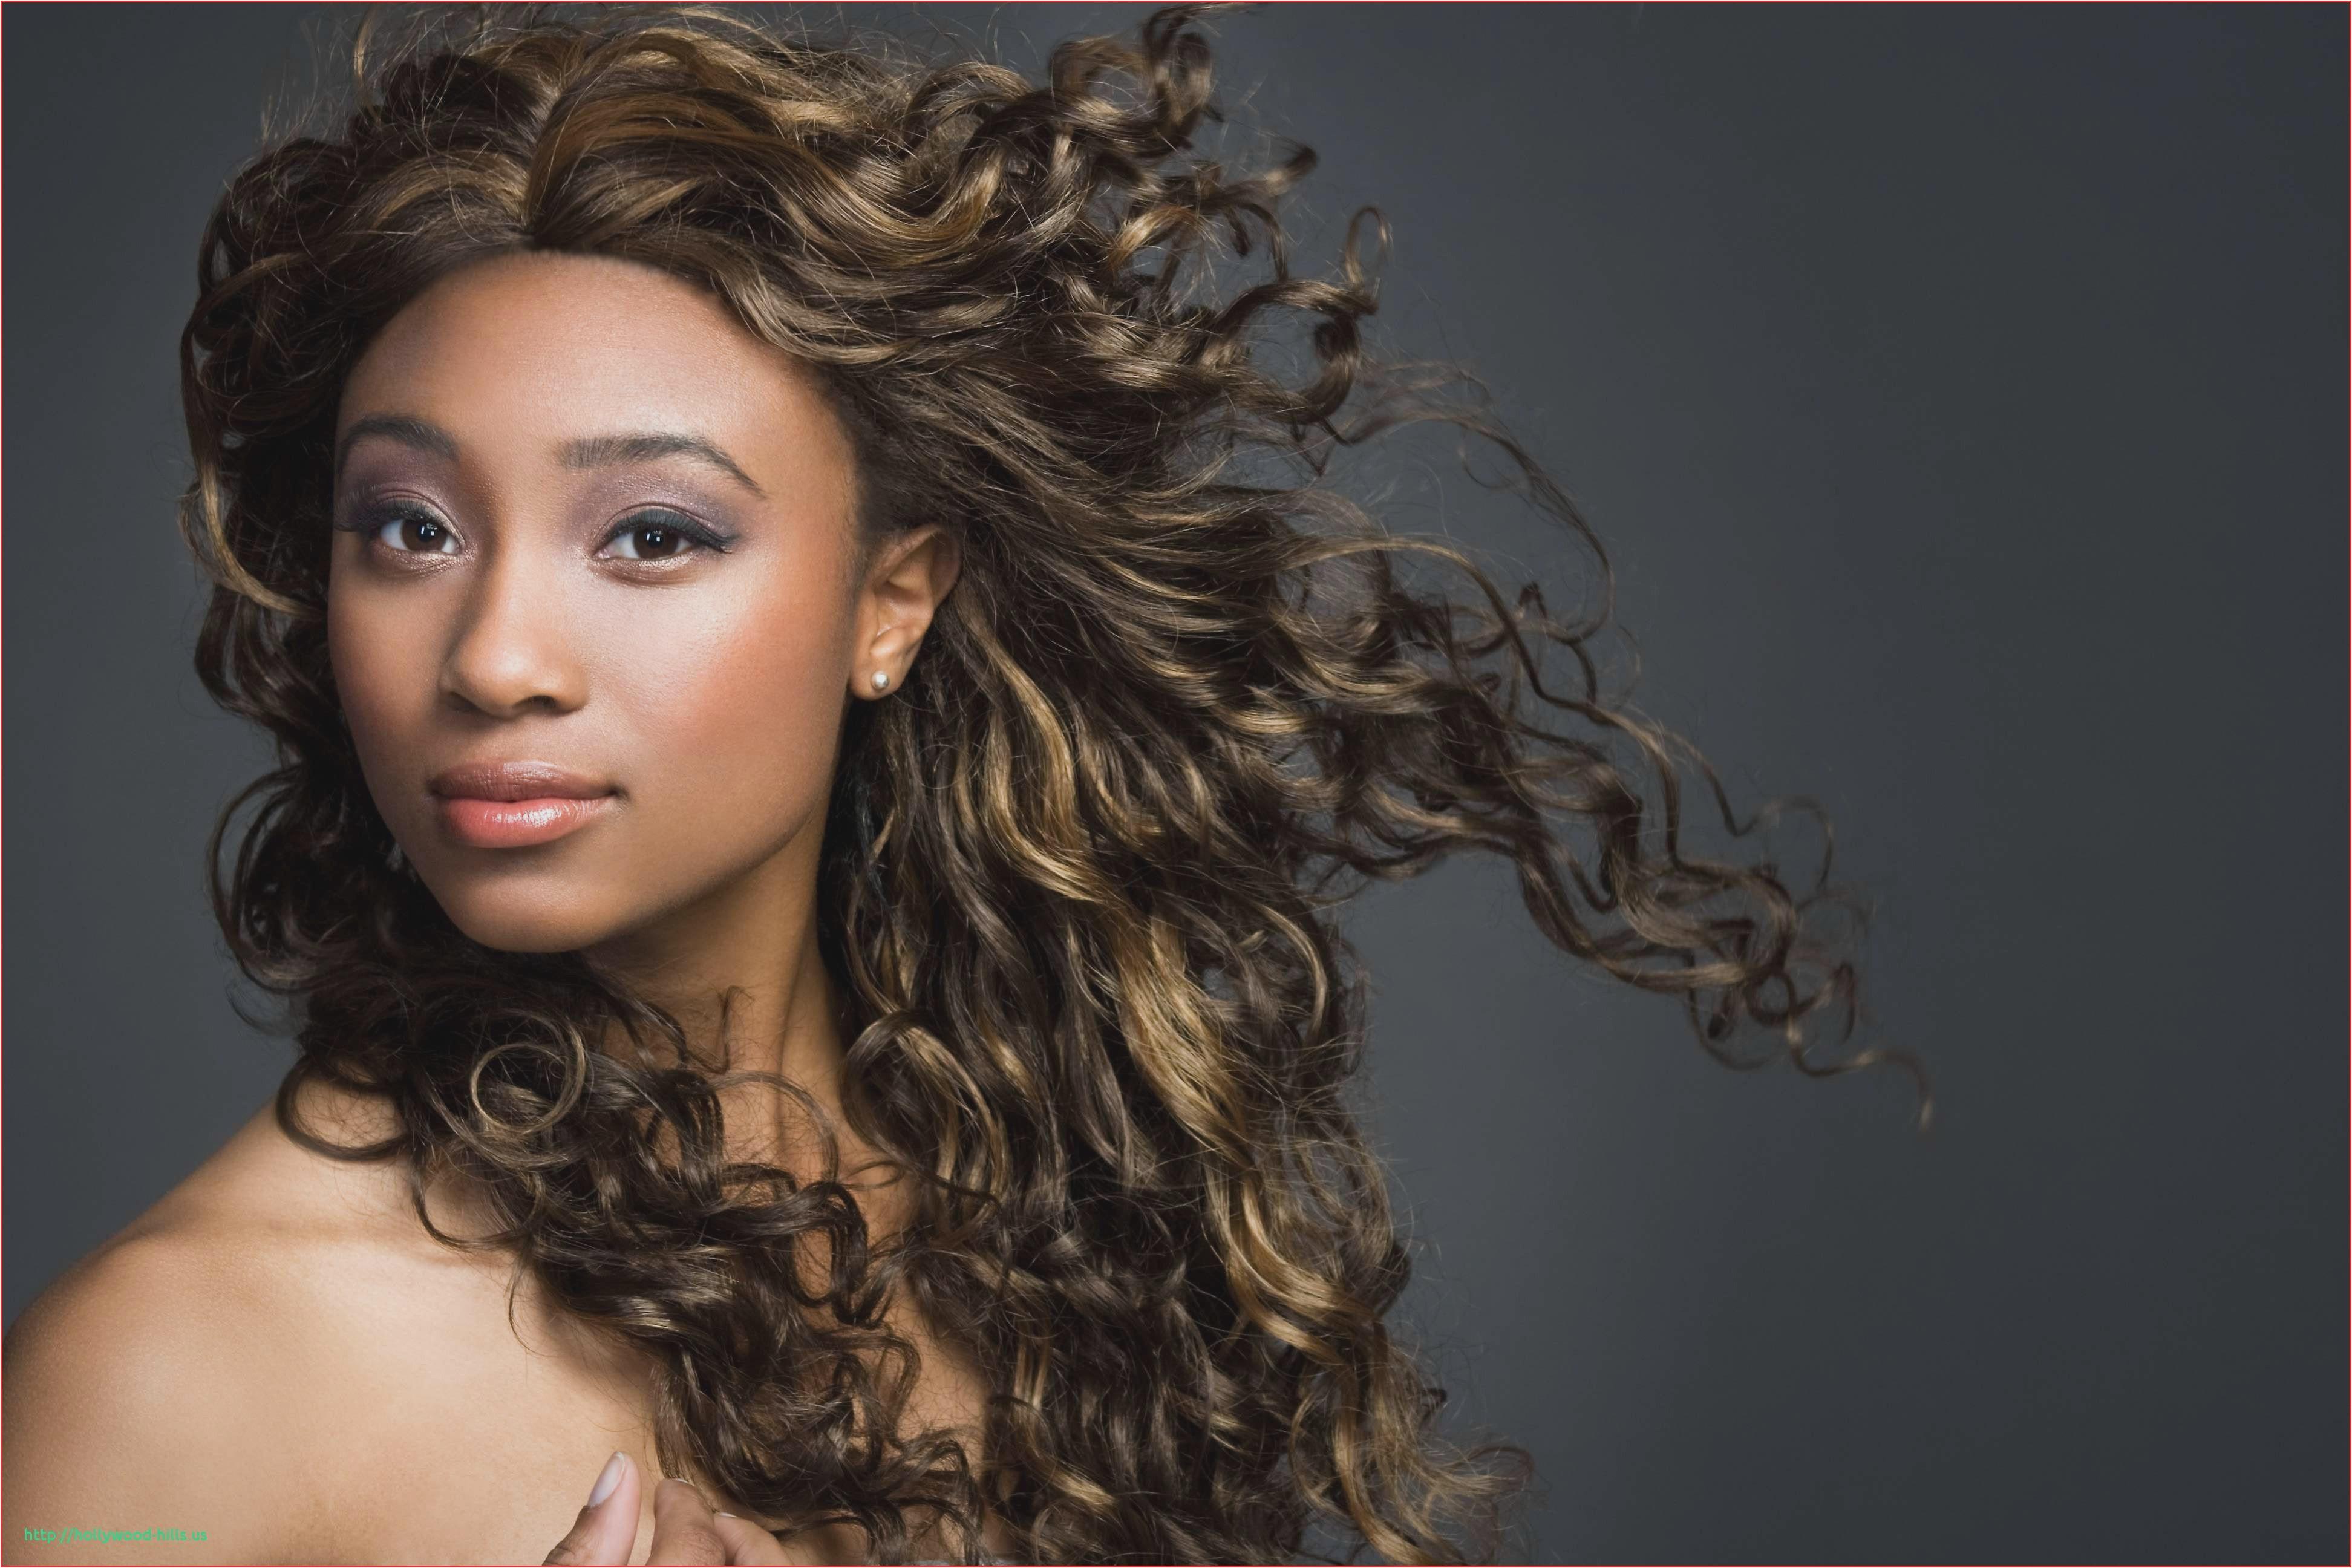 Human Hair Braids Hairstyles Girls Hairstyles Amazing Cute Girl Braid Hairstyles Home Design Human